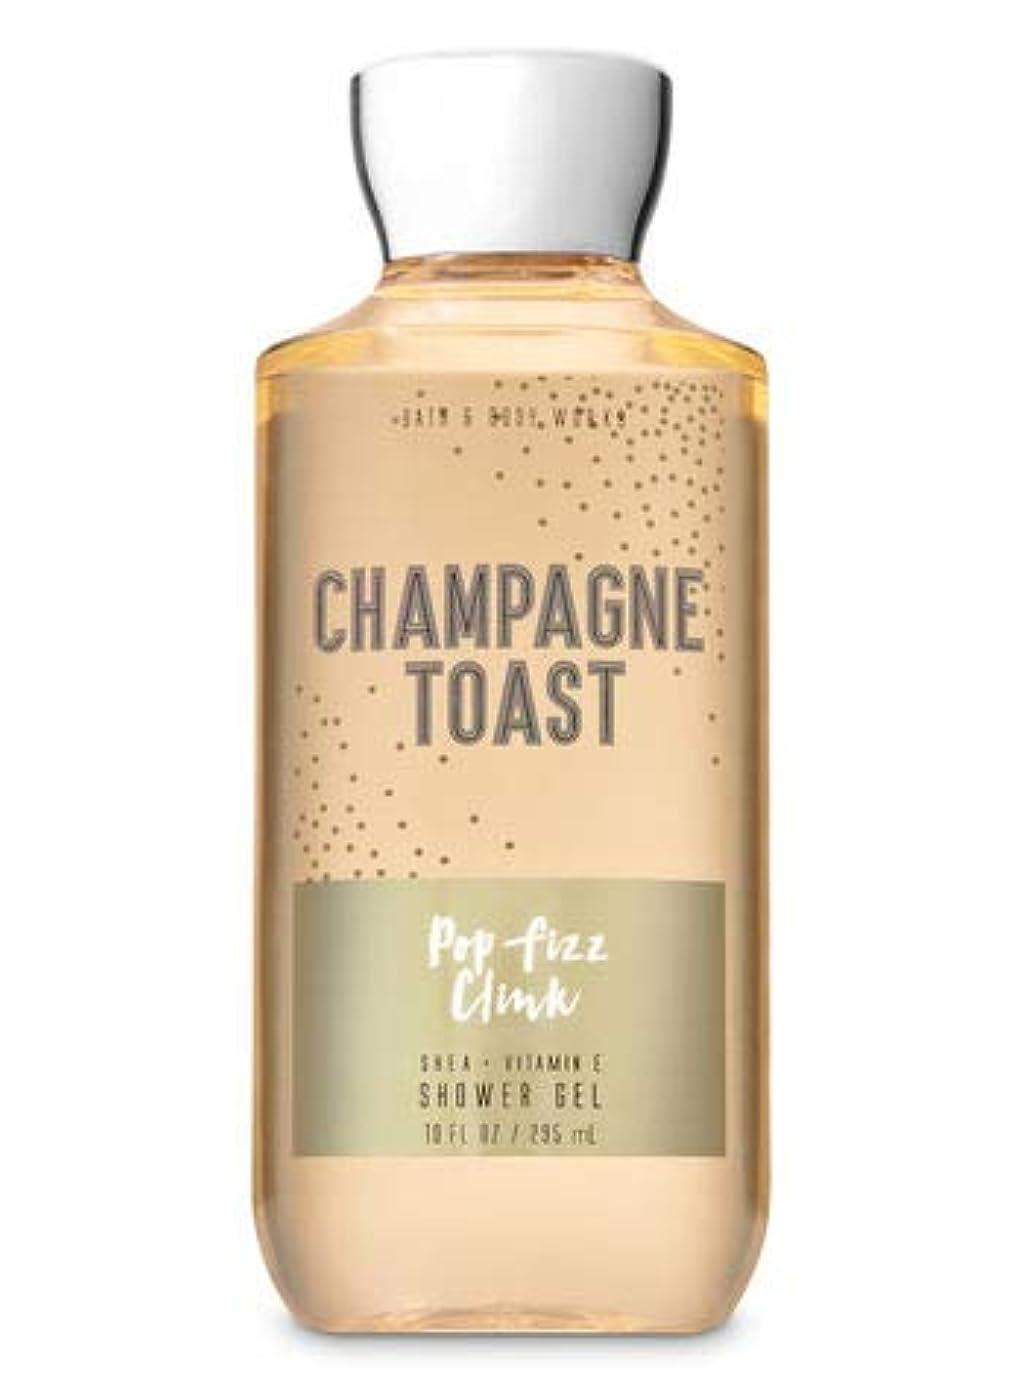 【Bath&Body Works/バス&ボディワークス】 シャワージェル シャンパントースト Shower Gel Champagne Toast 10 fl oz / 295 mL [並行輸入品]